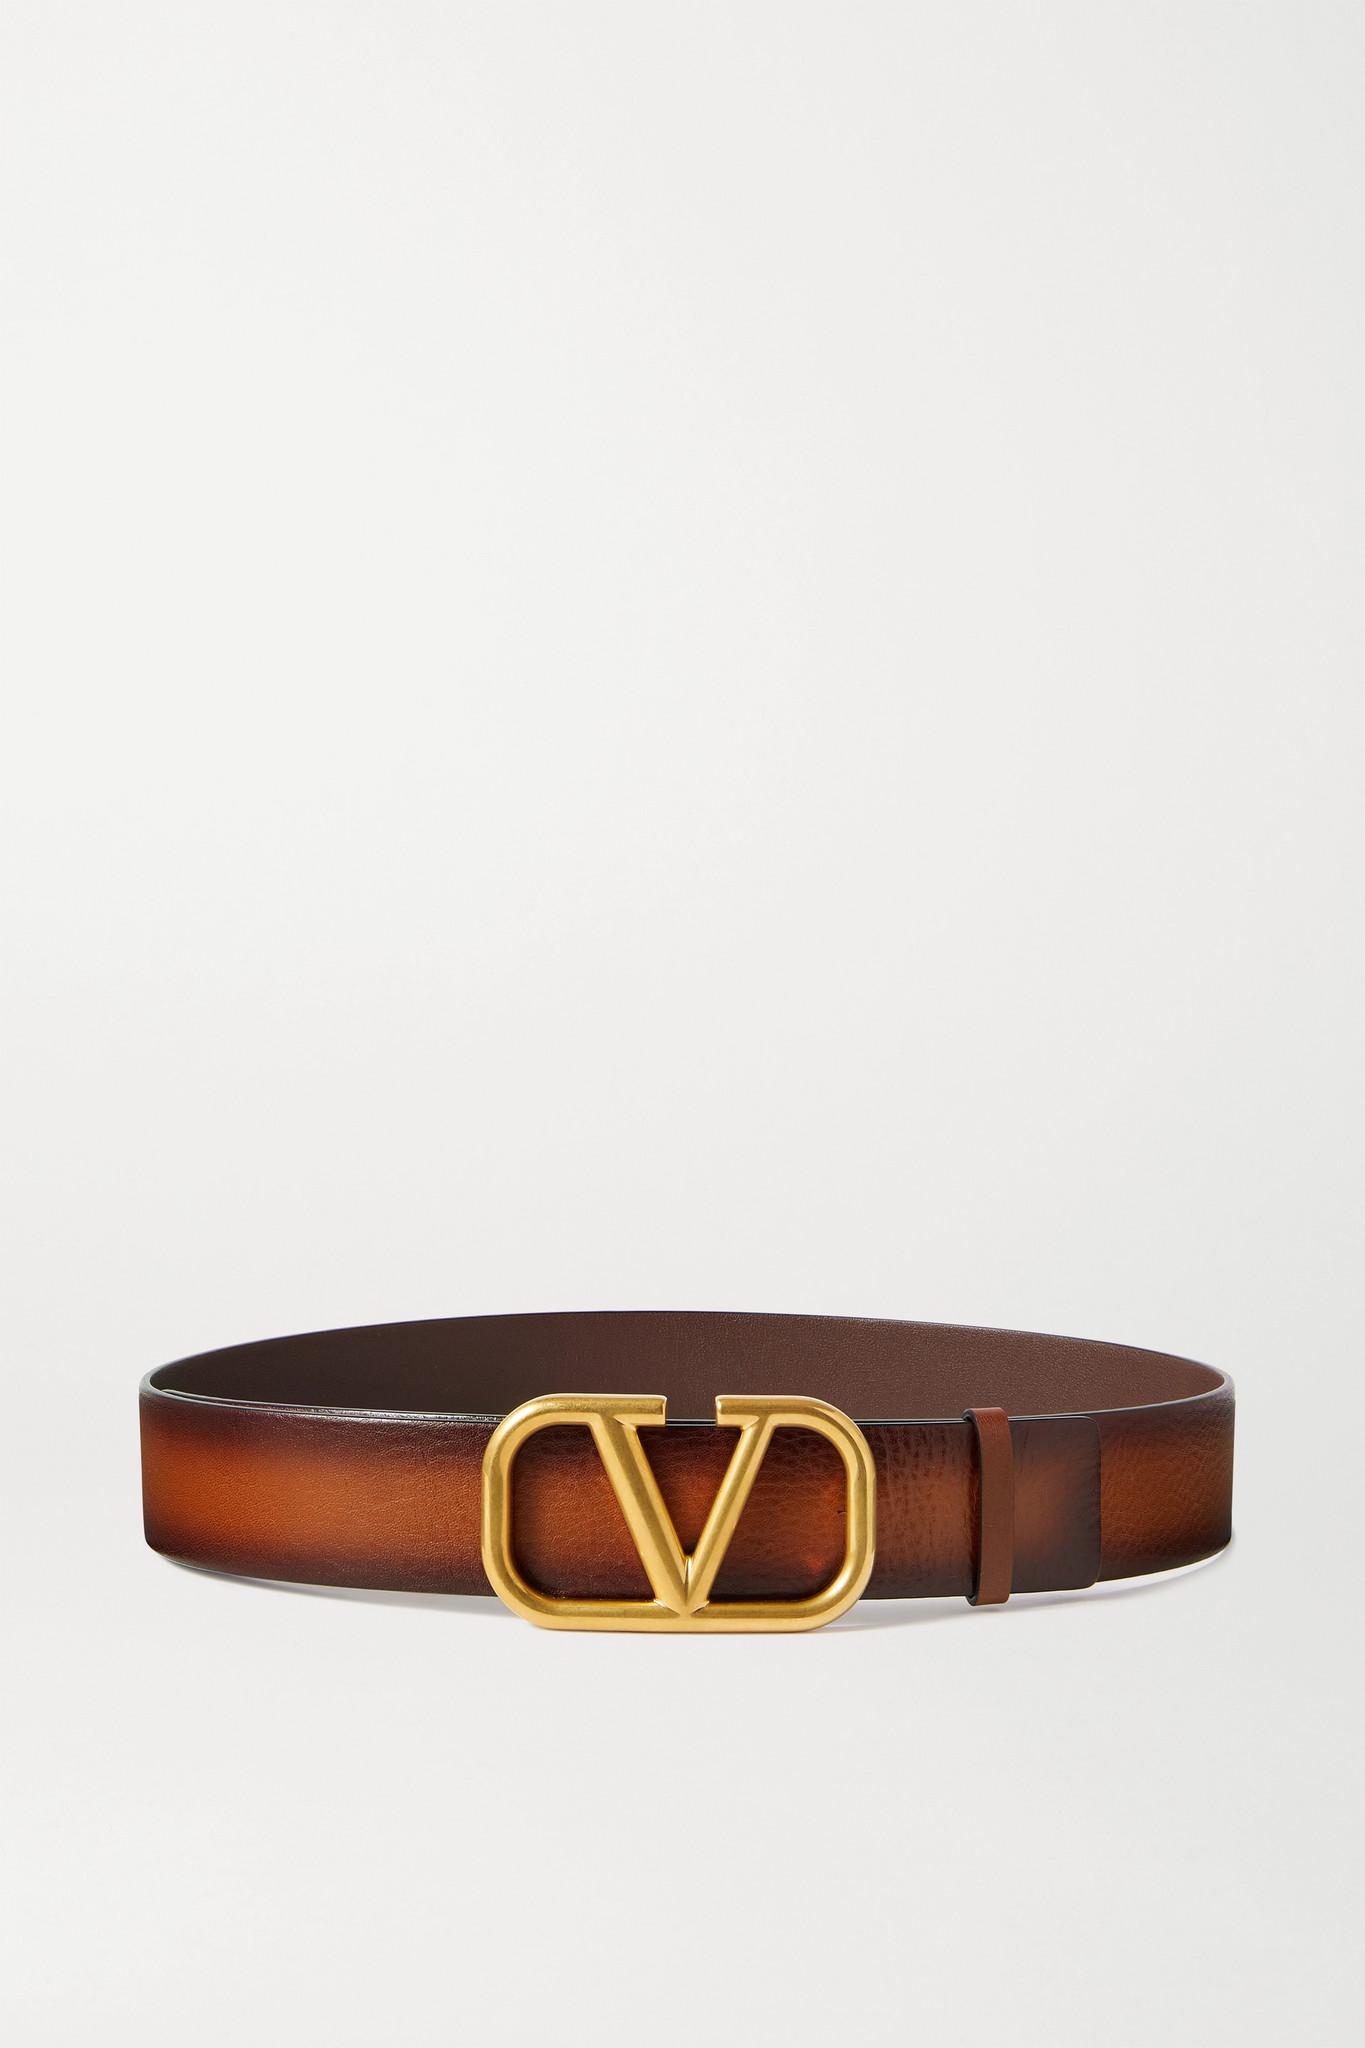 VALENTINO - Valentino Garavani Vlogo Leather Belt - Brown - 80